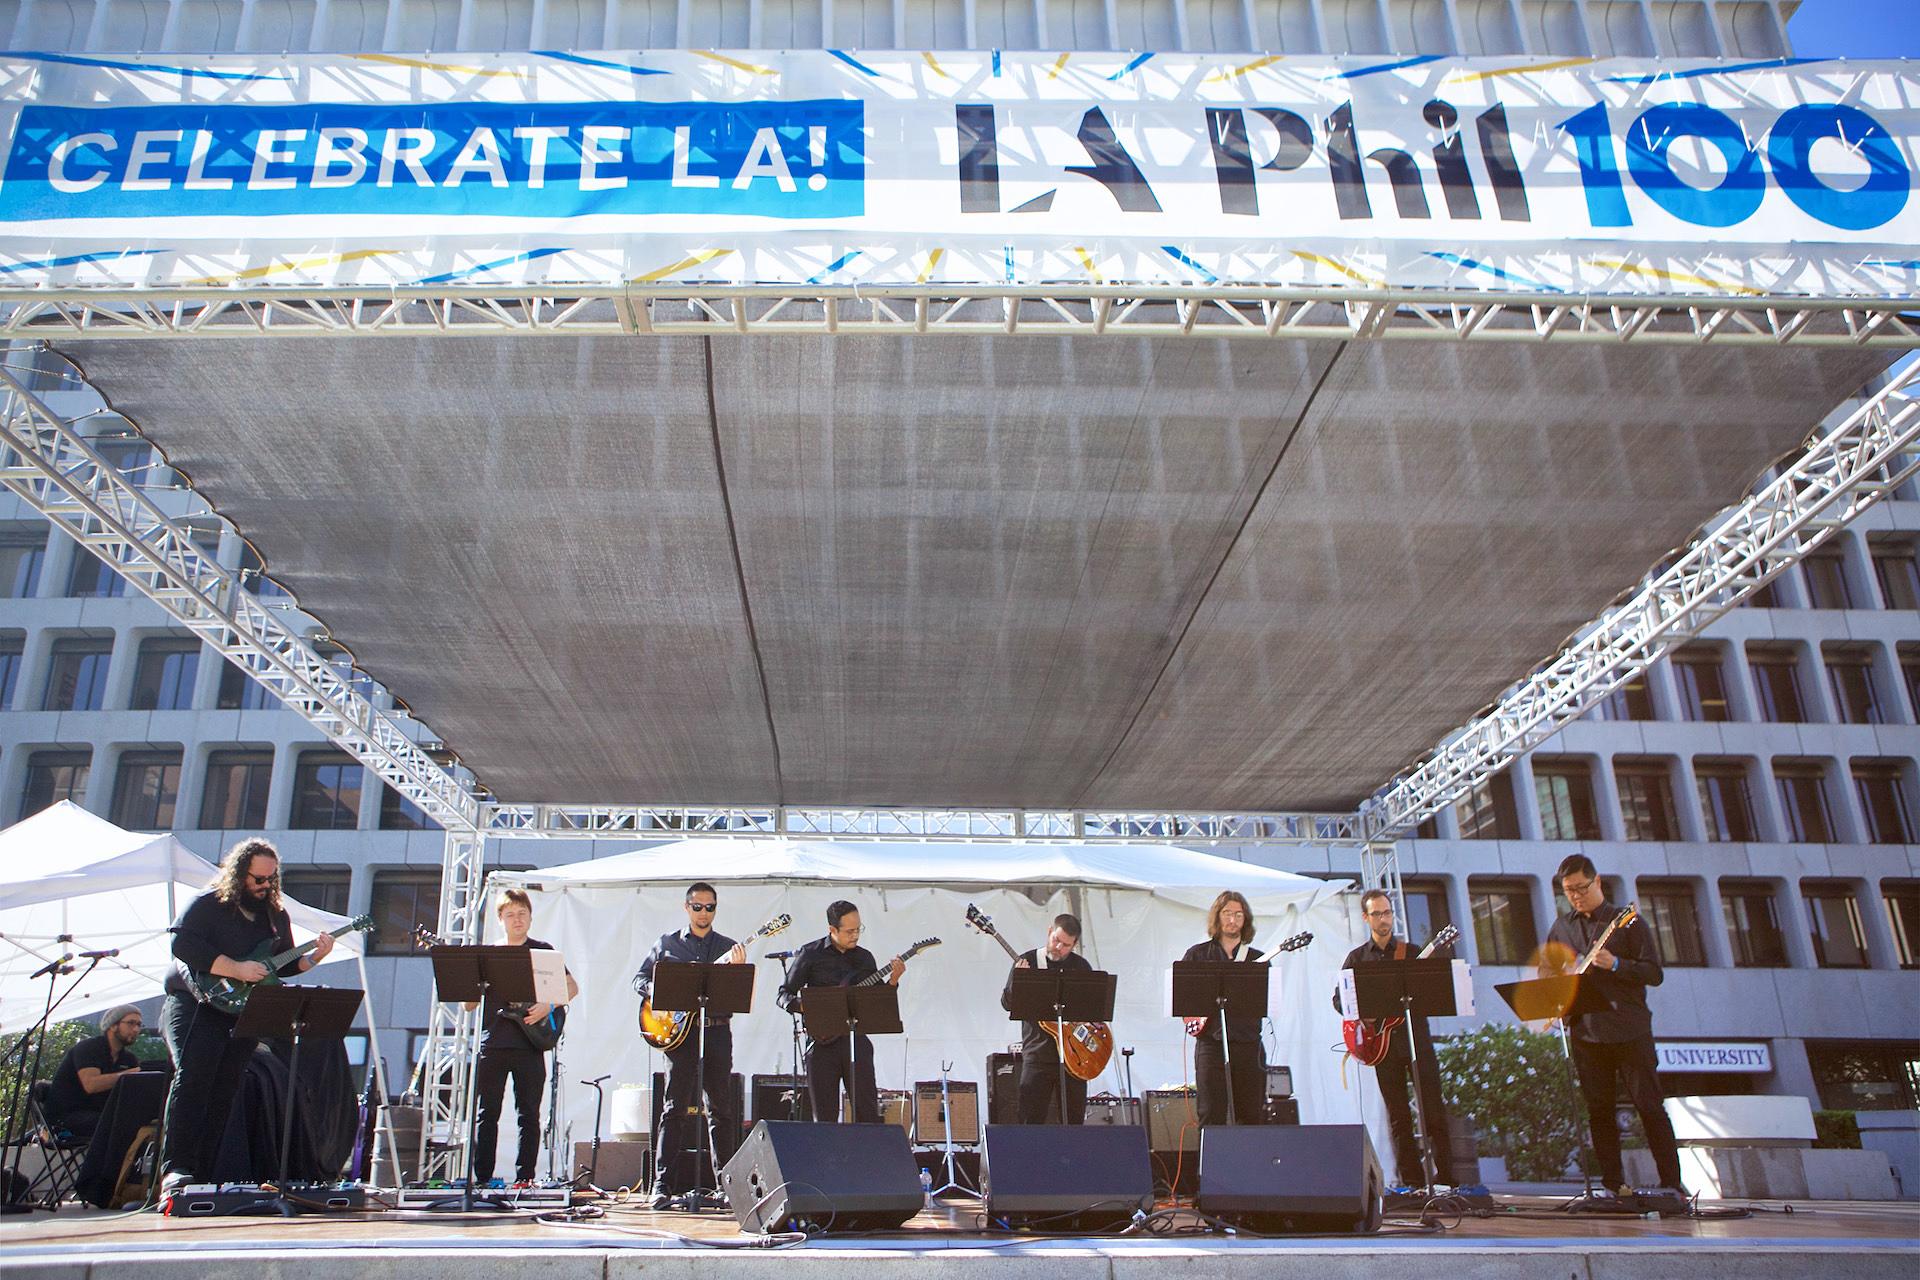 Photos from LA Phil 100 Celebrate LA